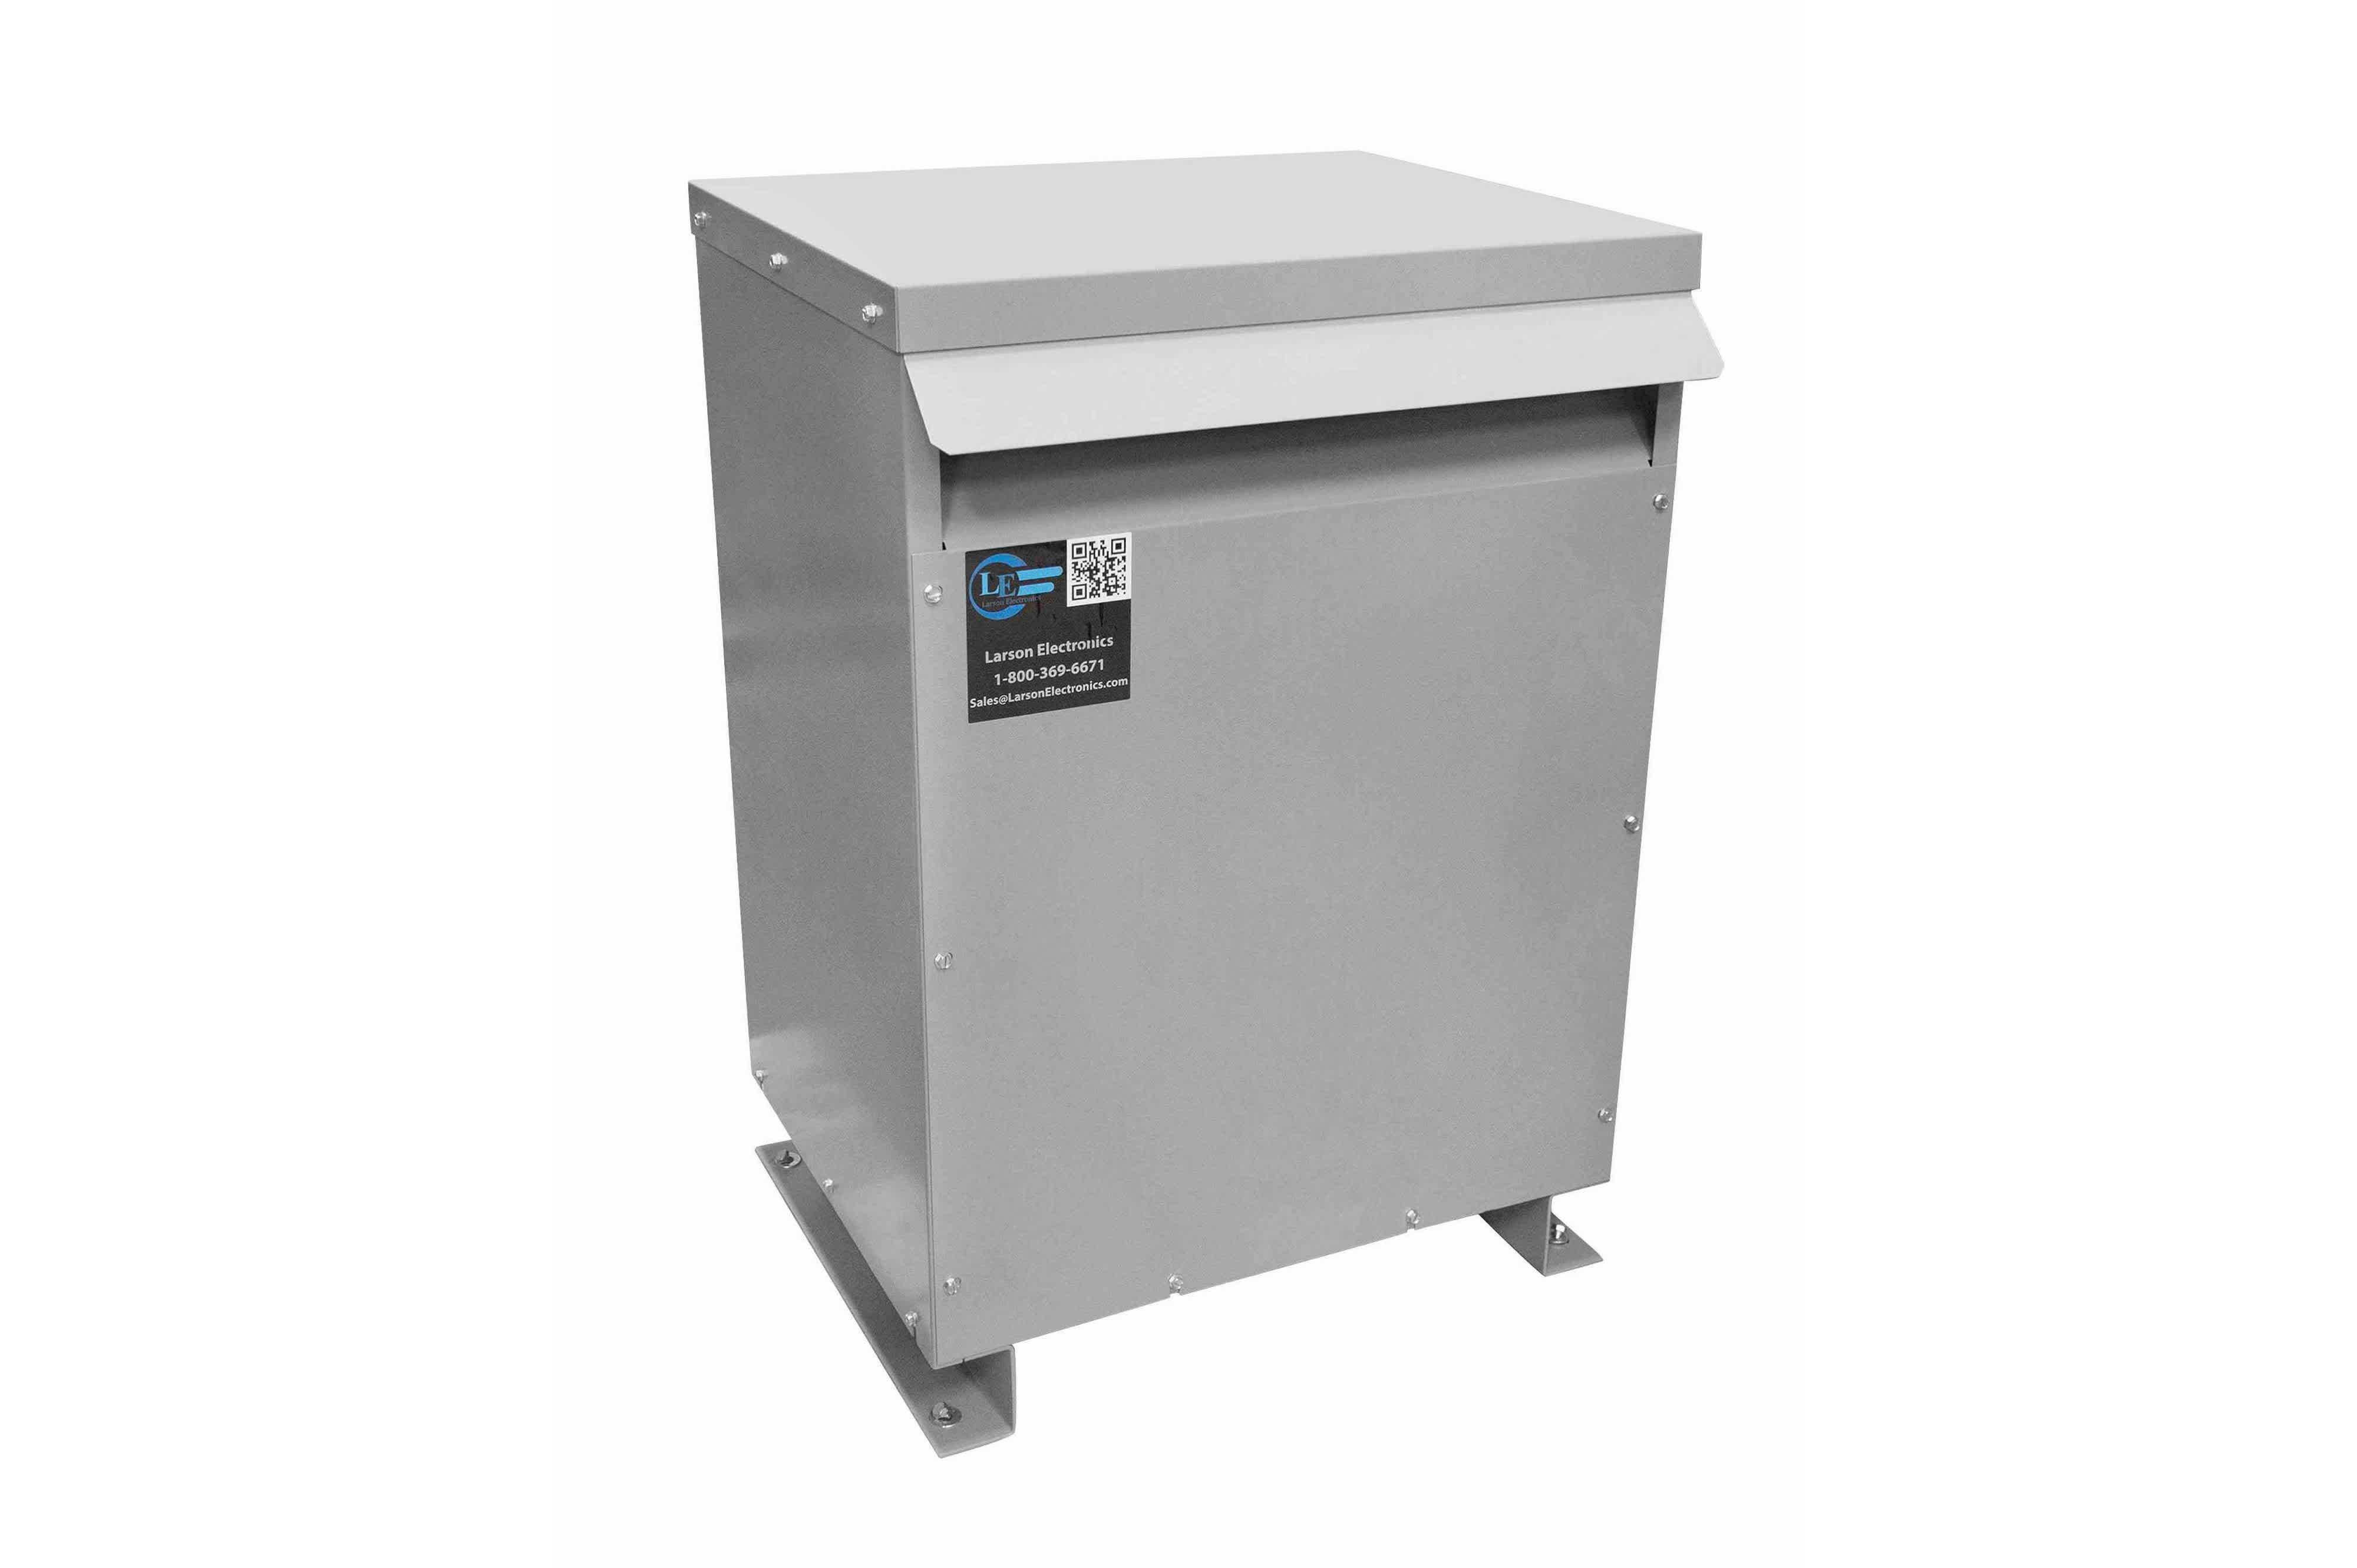 112.5 kVA 3PH Isolation Transformer, 400V Wye Primary, 240V/120 Delta Secondary, N3R, Ventilated, 60 Hz